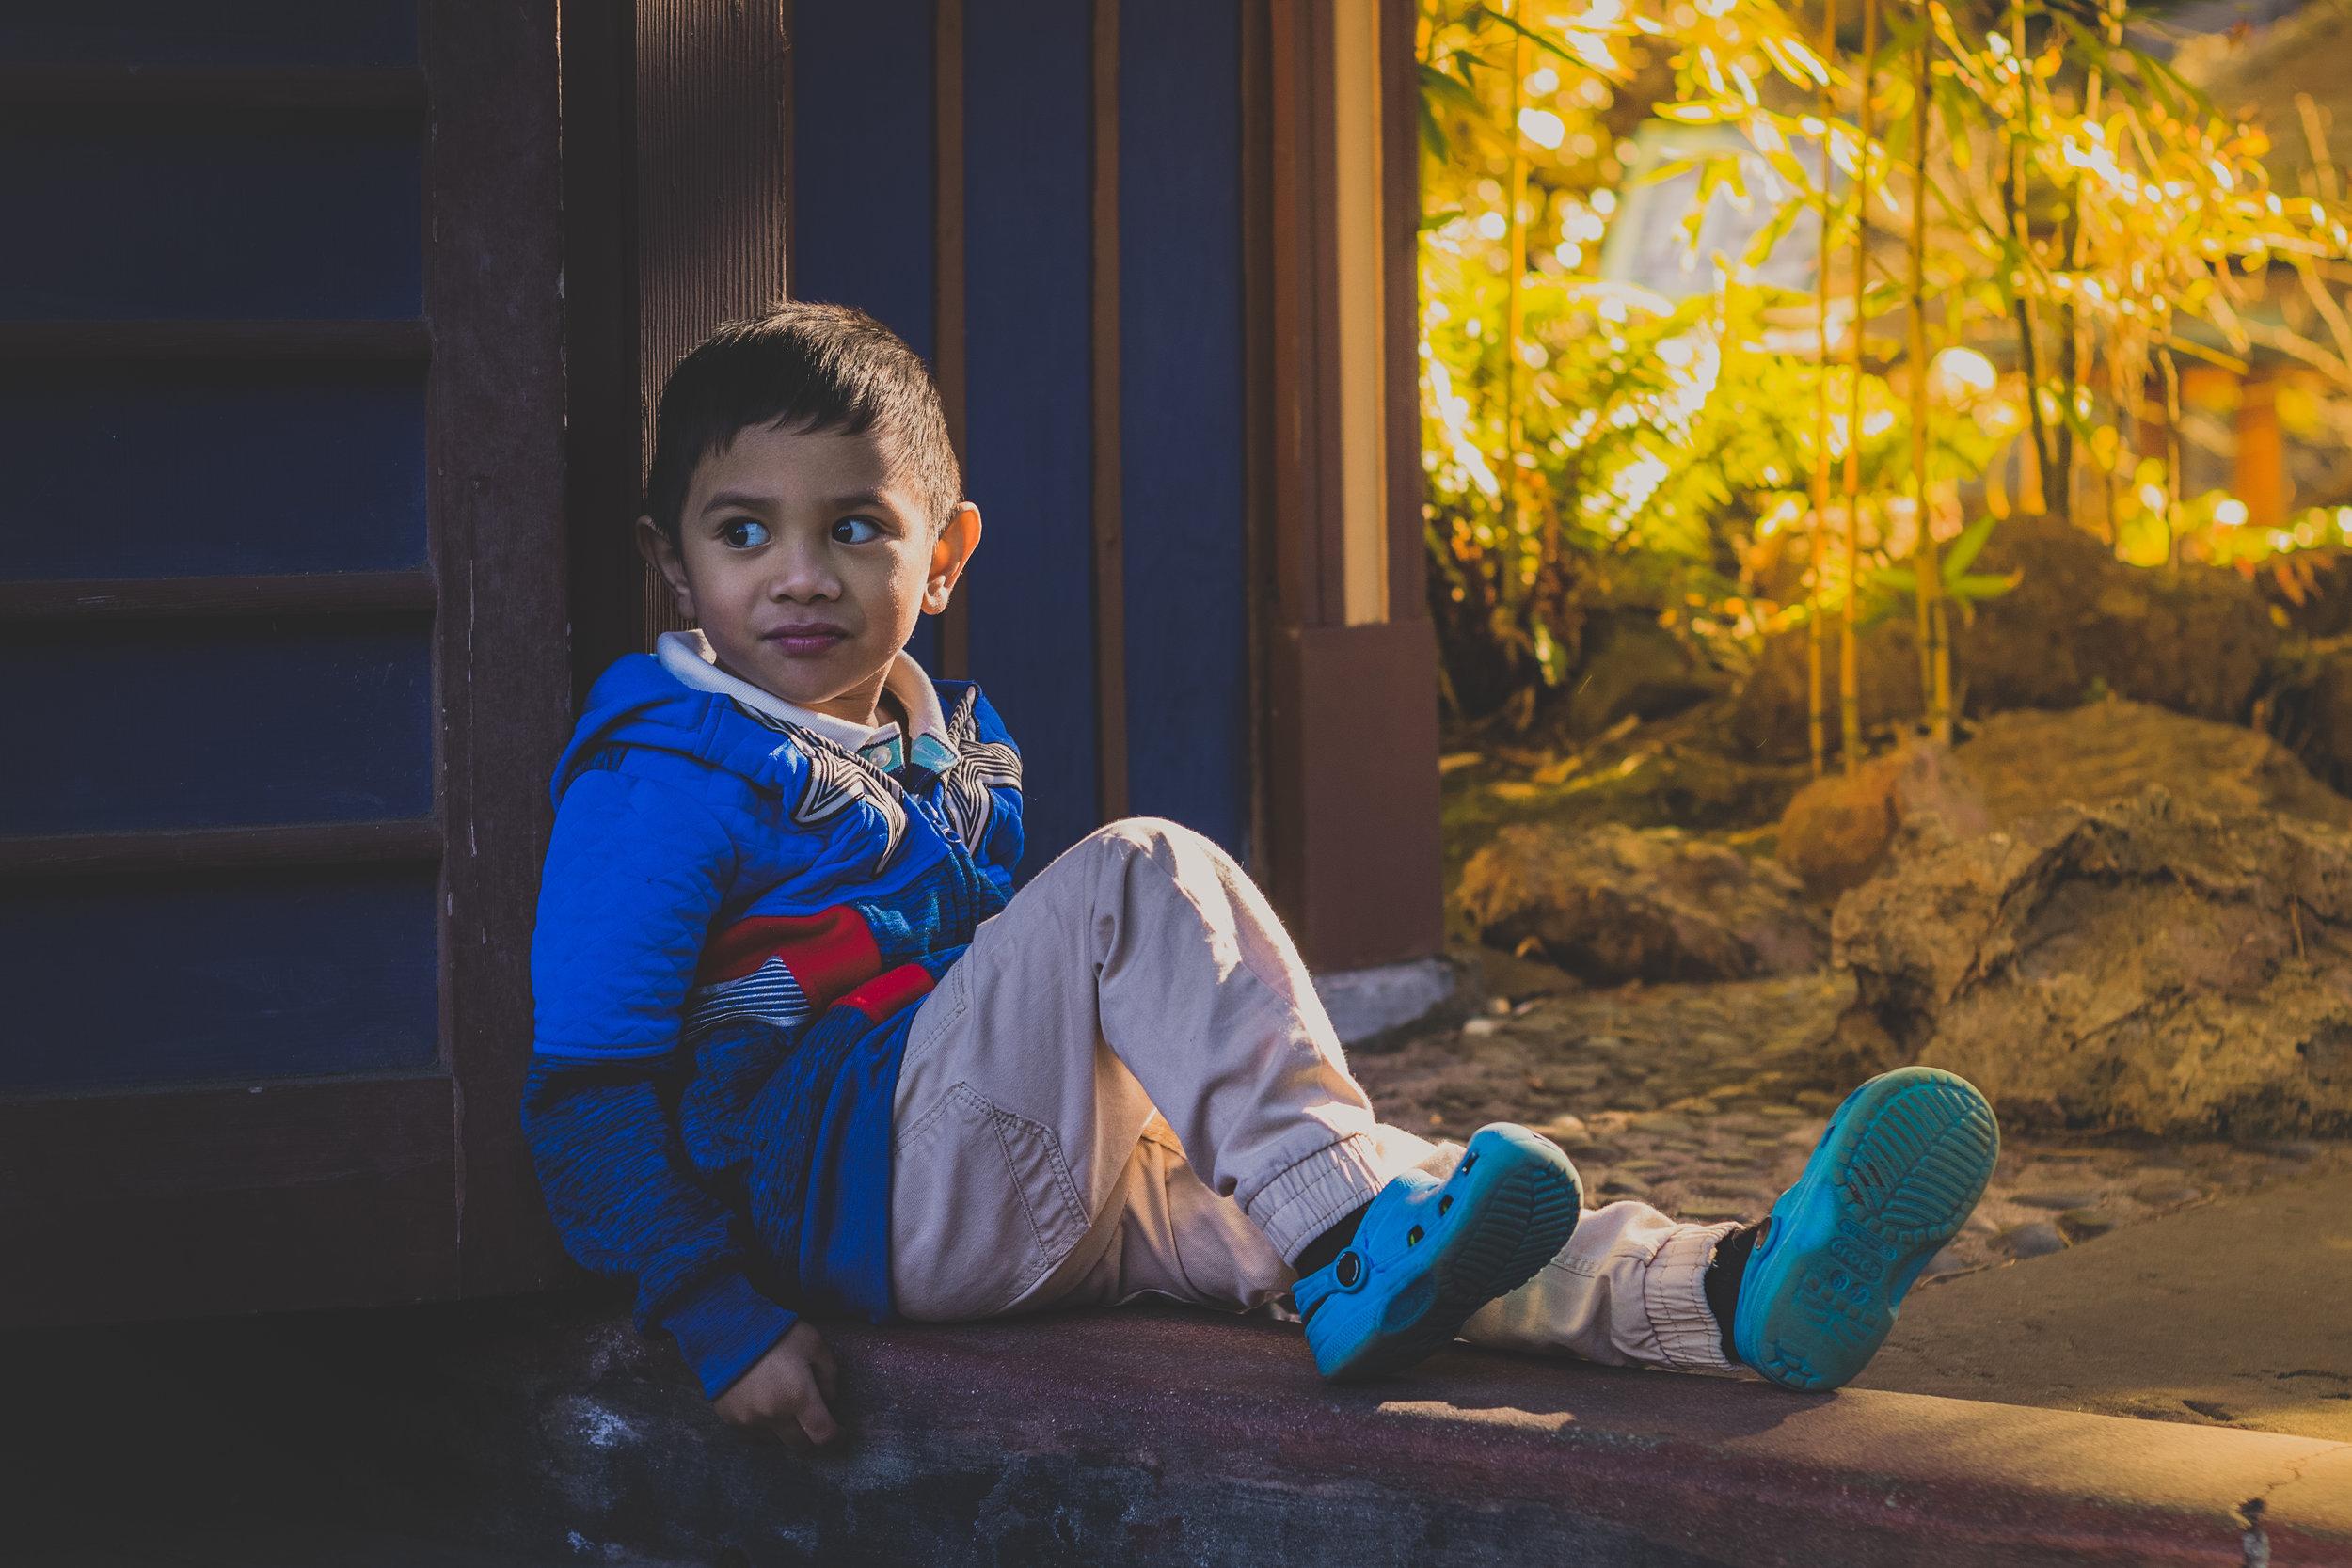 Buhay Photography 2017